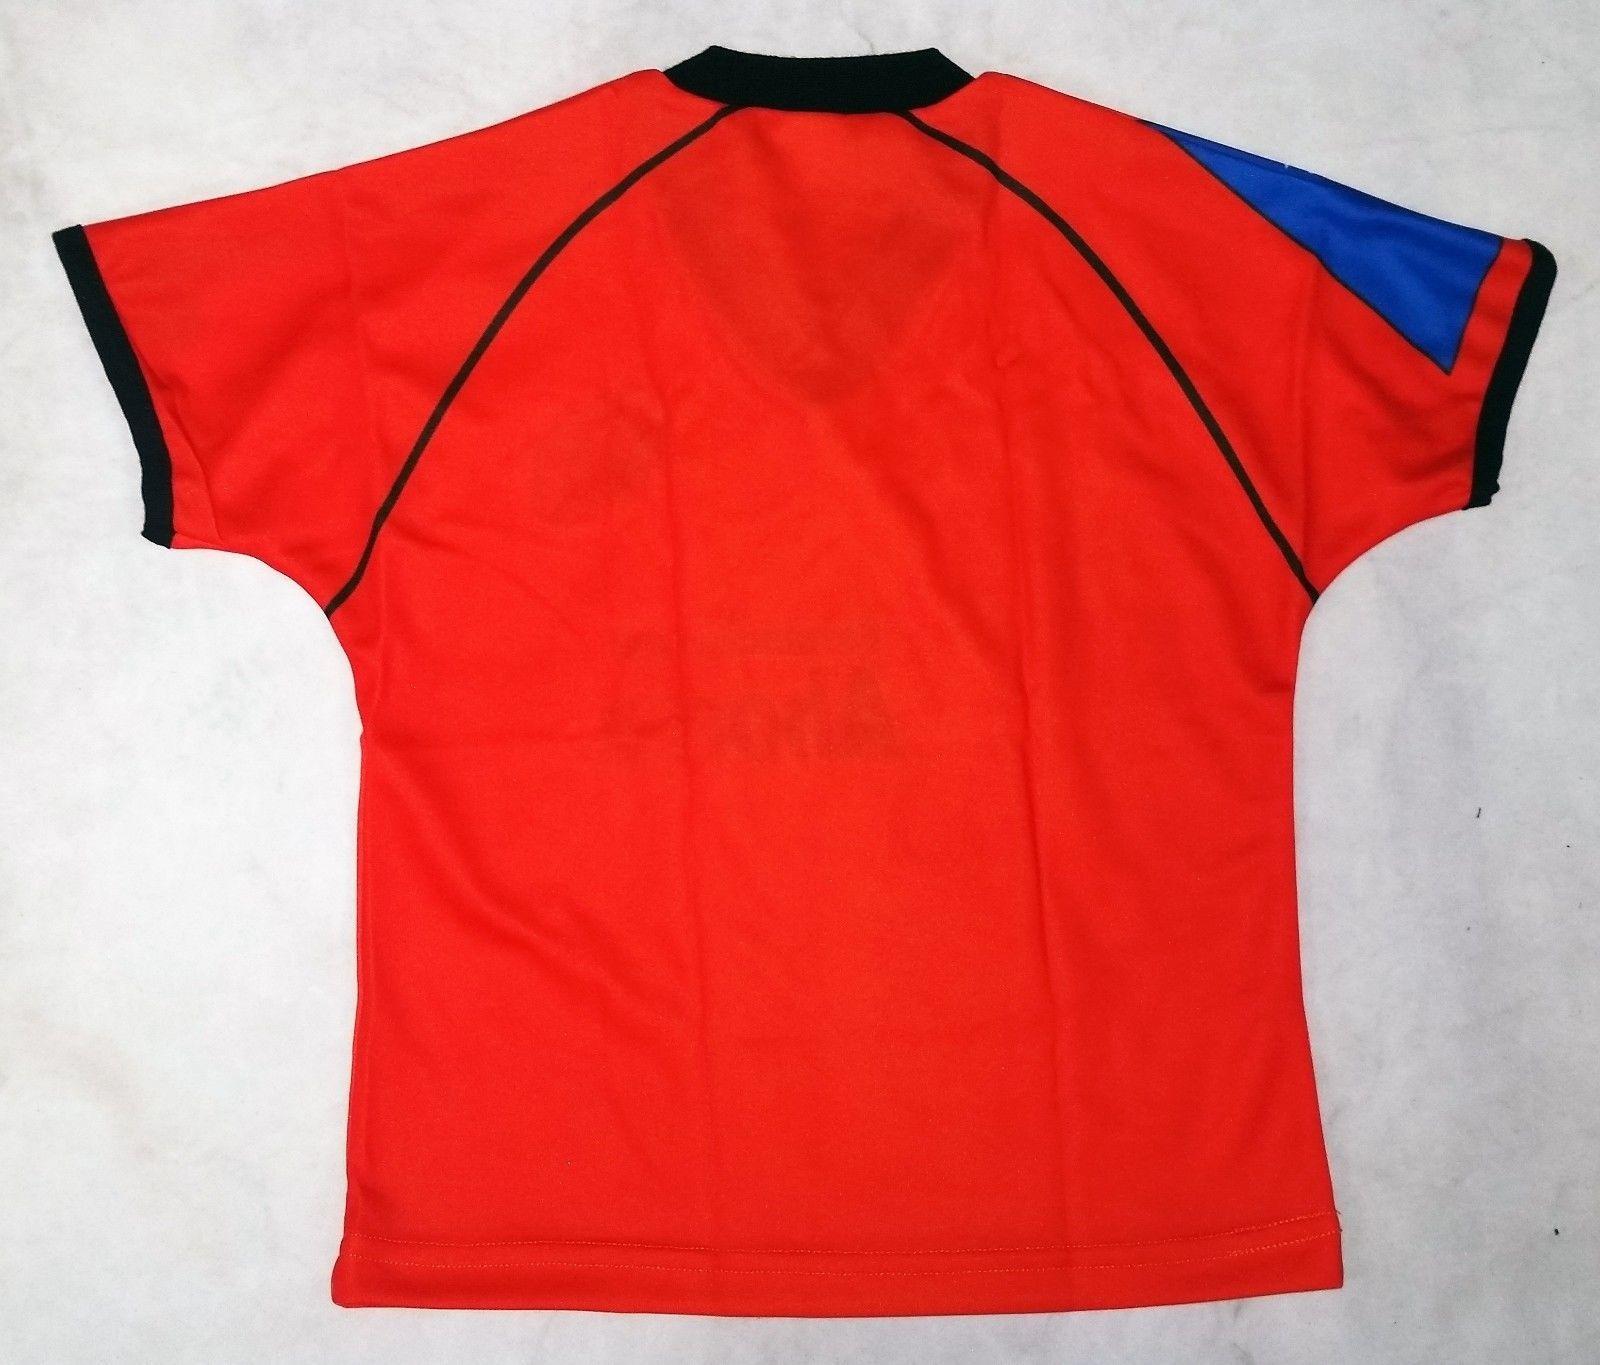 88657ffd6 Jaguares de Chiapas Home Youth Soccer and 50 similar items